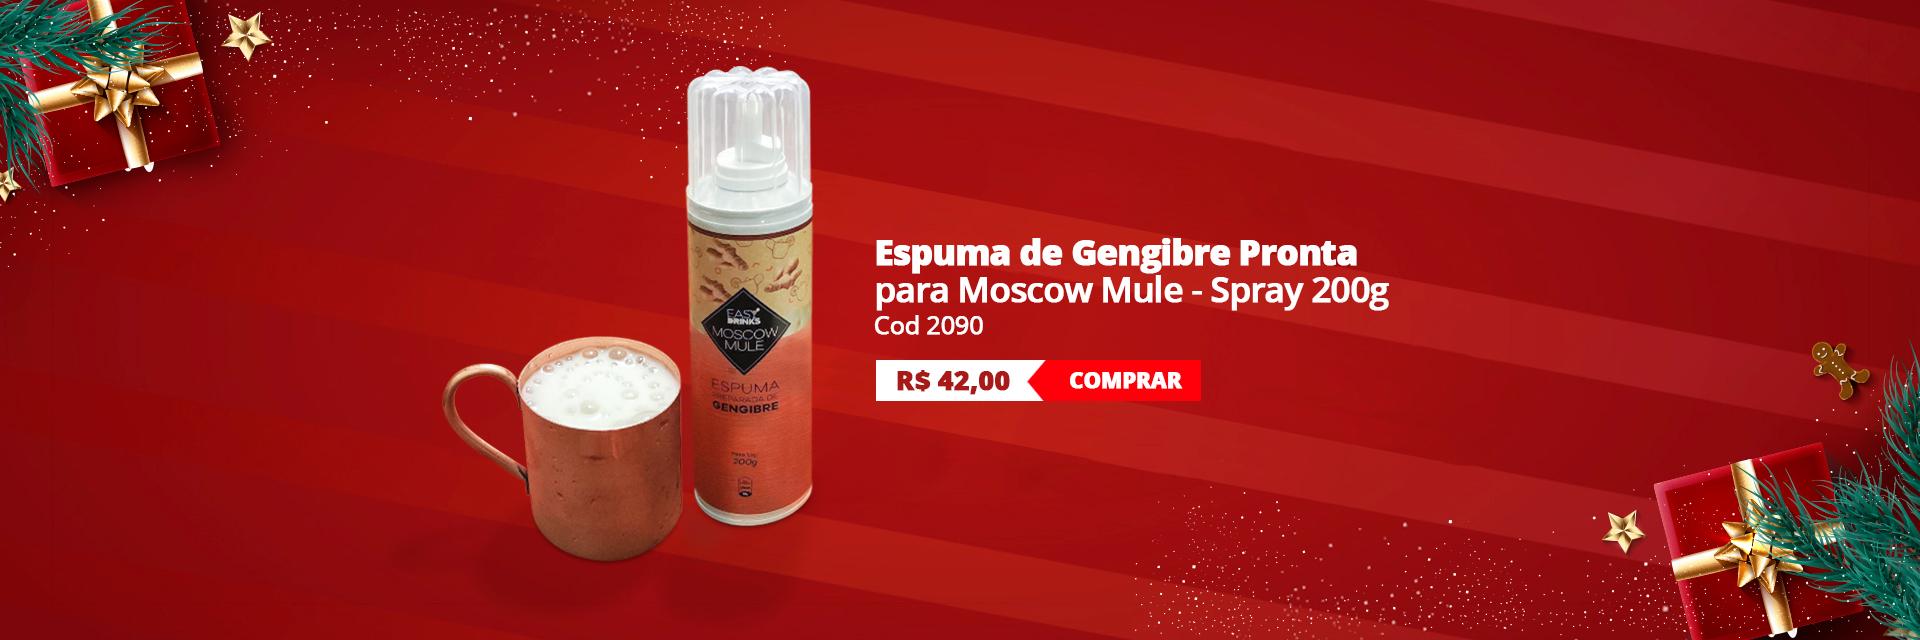 Espuma de Gengibre para Moscow Mule Pronta Spray 200g